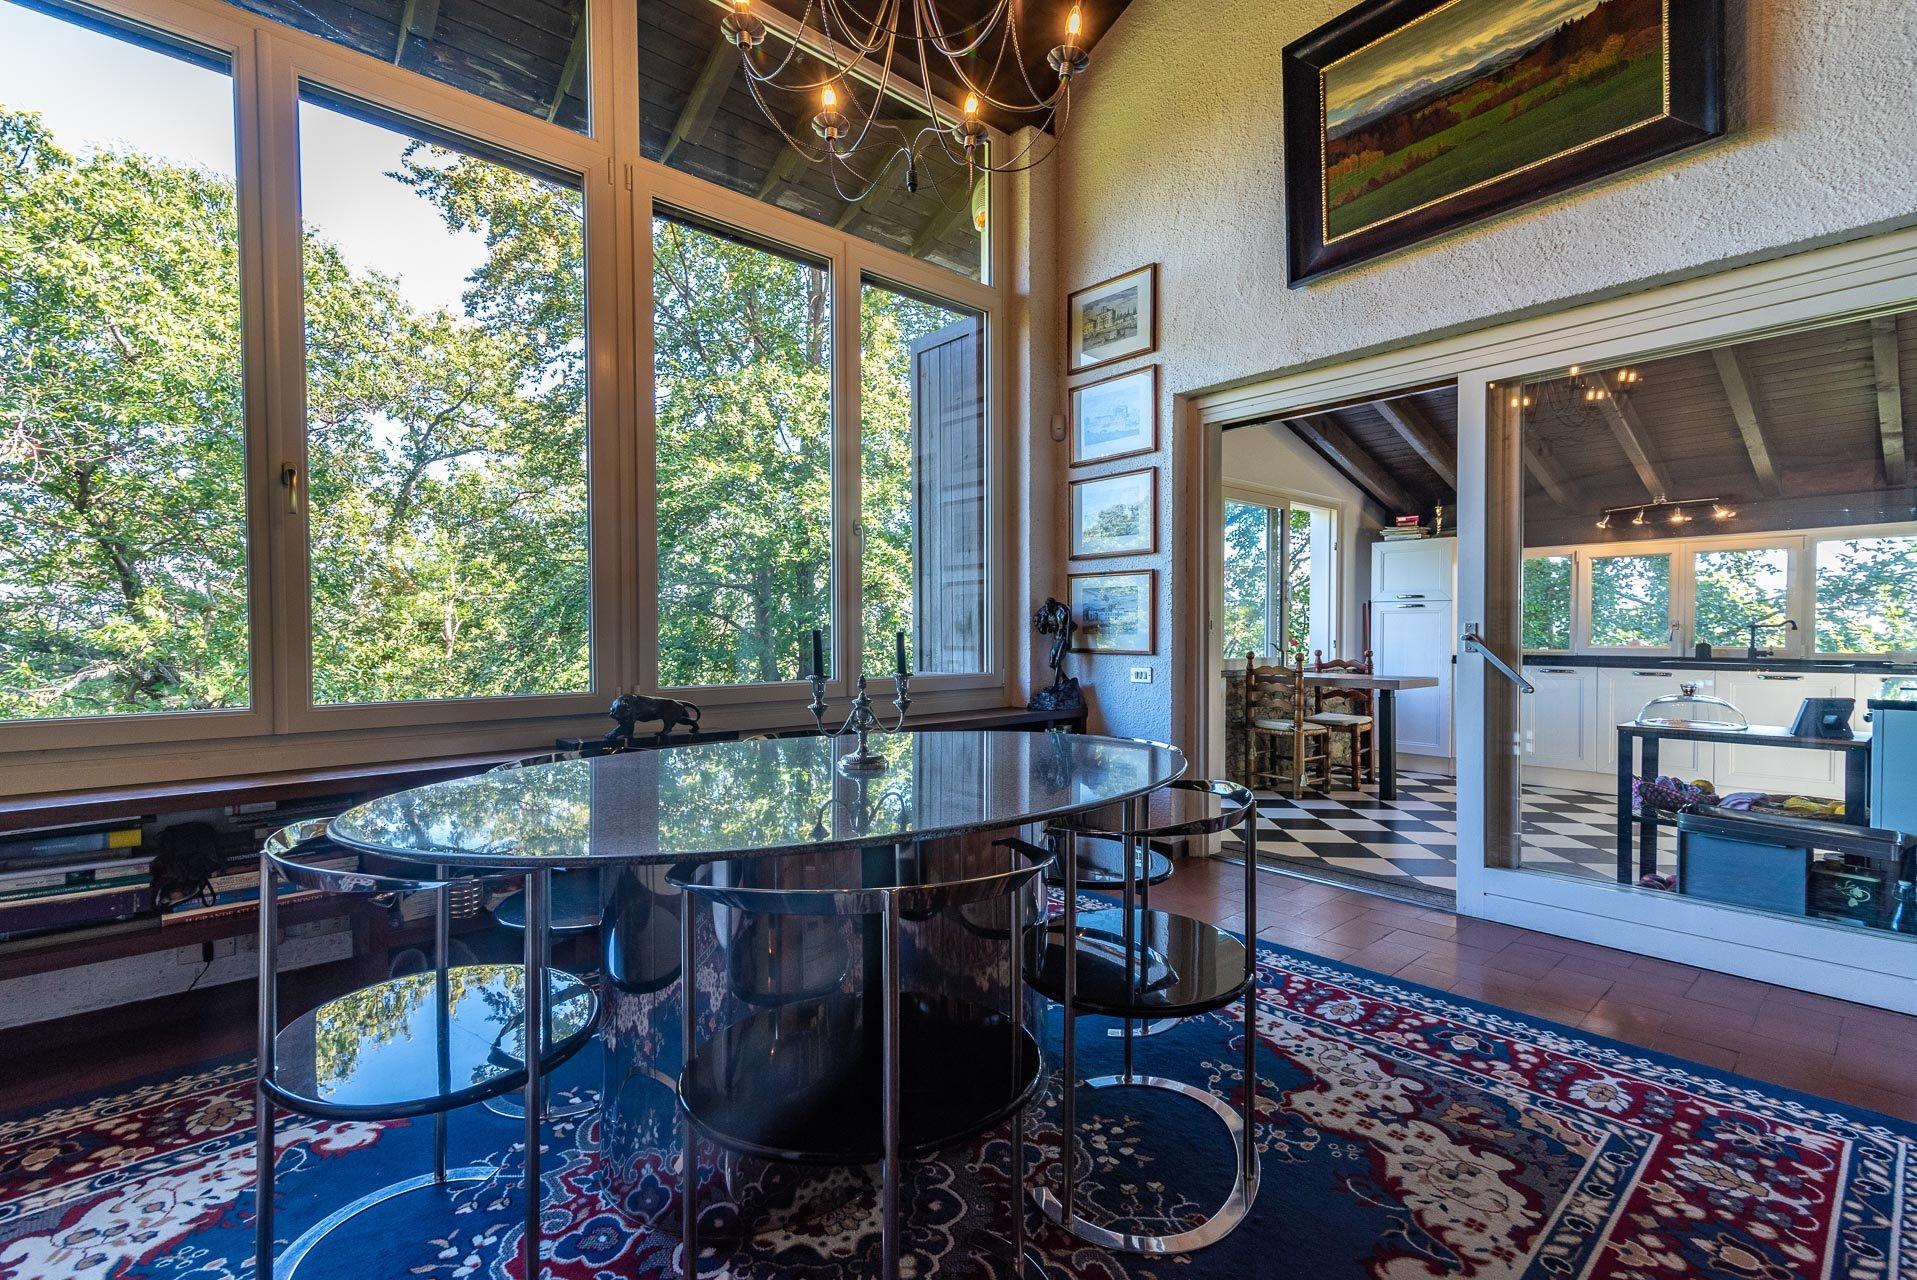 Villa con piscina in vendita a Gignese - sala da pranzo